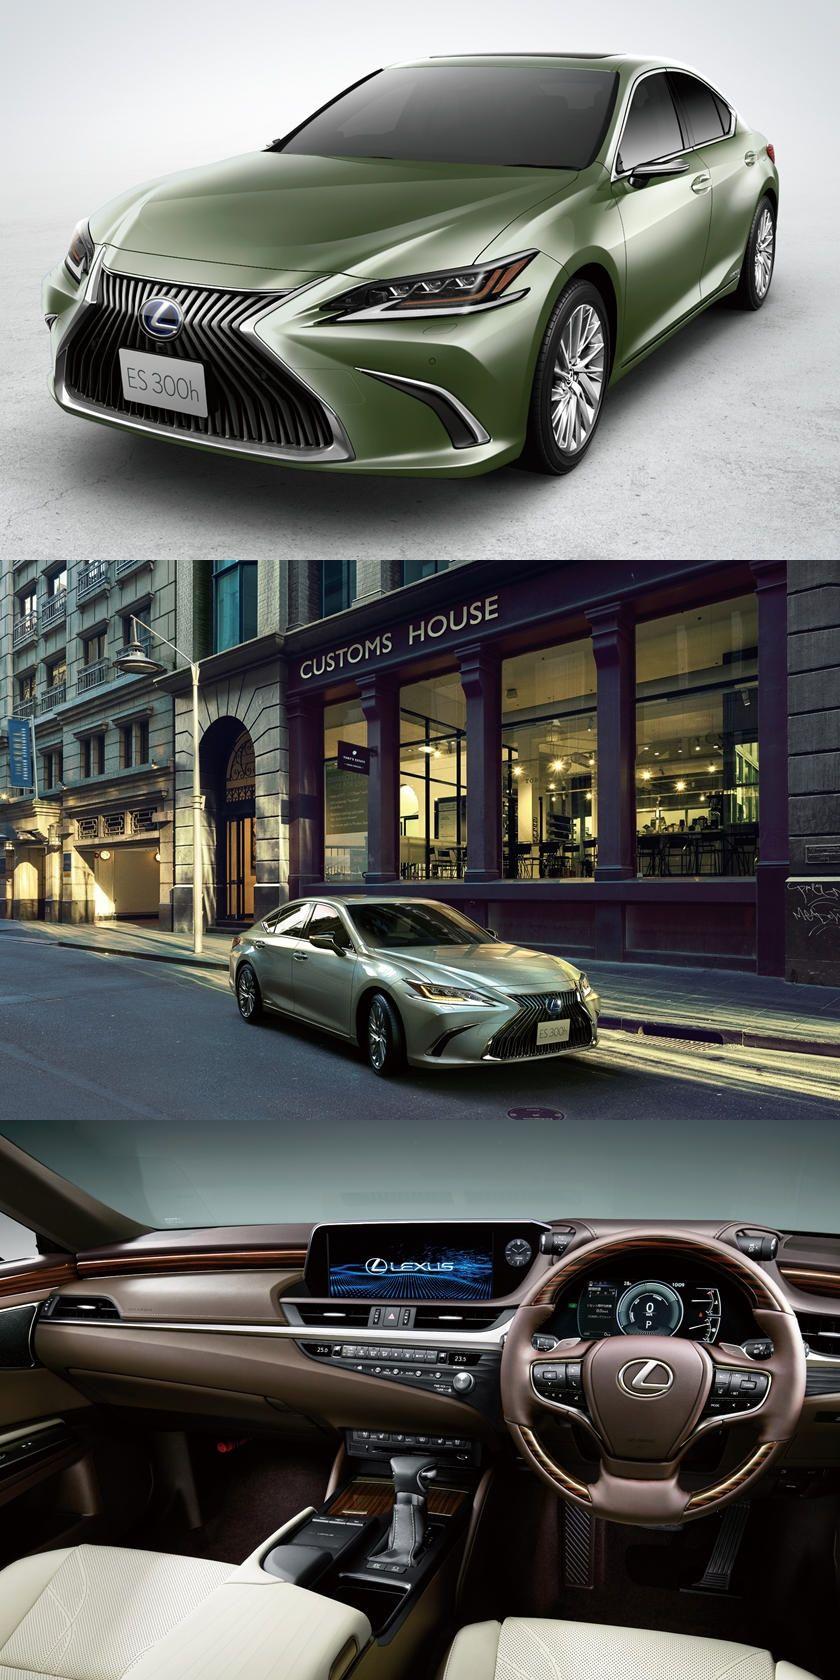 2021 Lexus Es Hybrid Is Even More Efficient Than Before A New Lithium Ion Battery Has Been Introduced Lexus Es Lexus Lexus 350